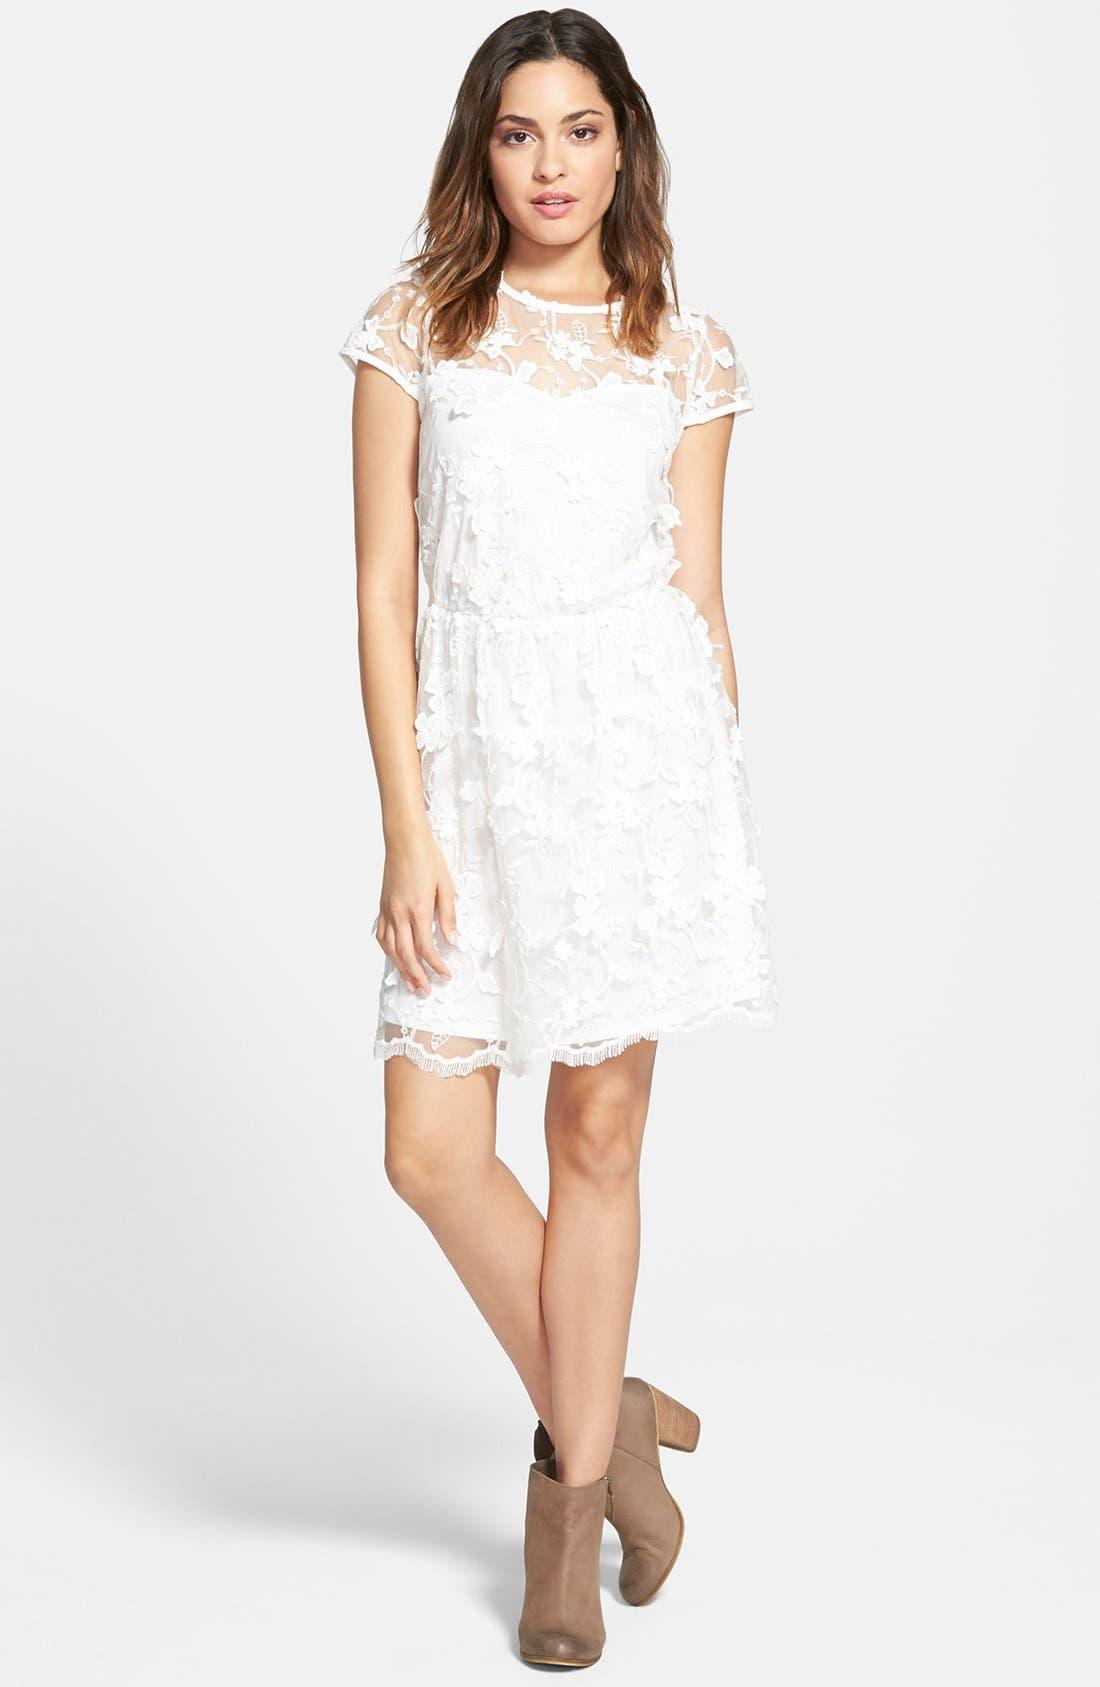 Main Image - Leola Couture Floral Embroidered Skater Dress